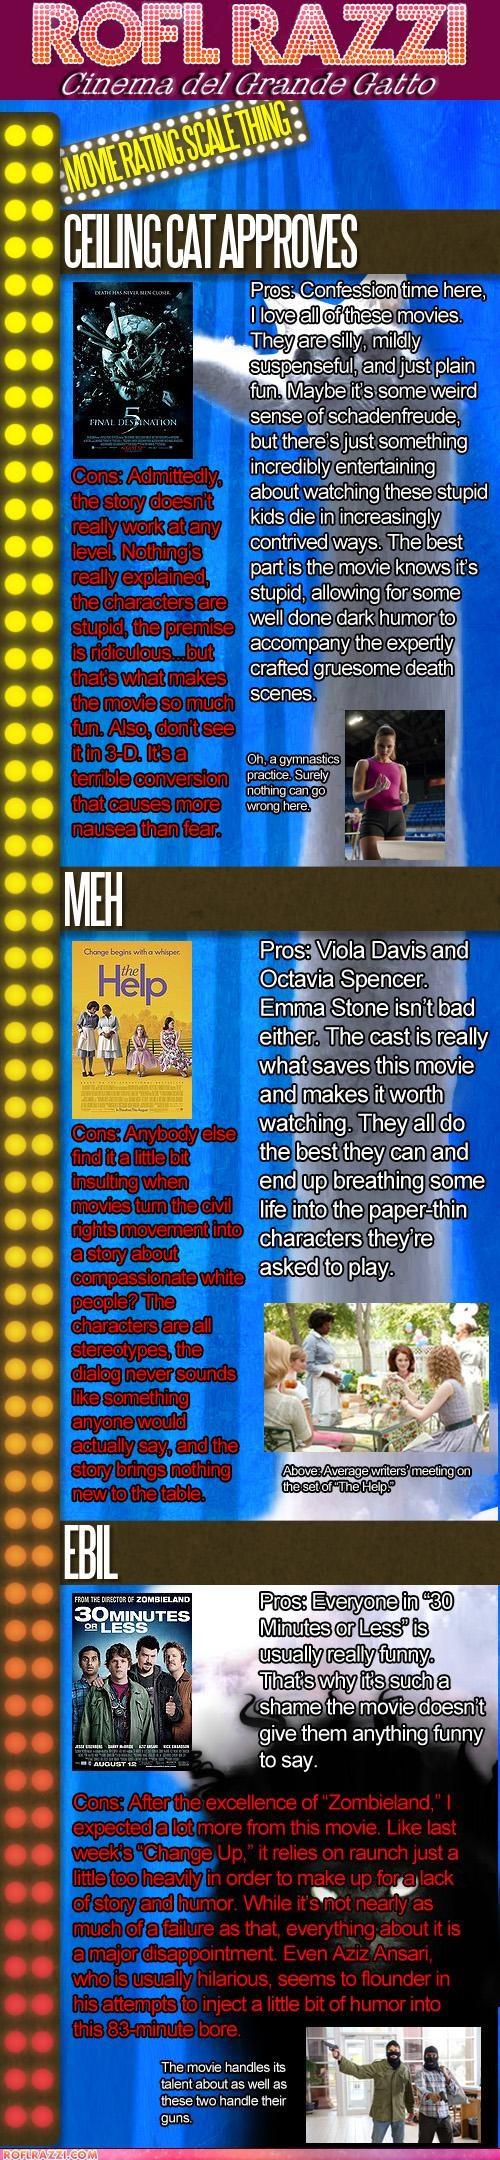 aziz ansari cinema emma stone movies octavia spencer reviews the help - 5081608448